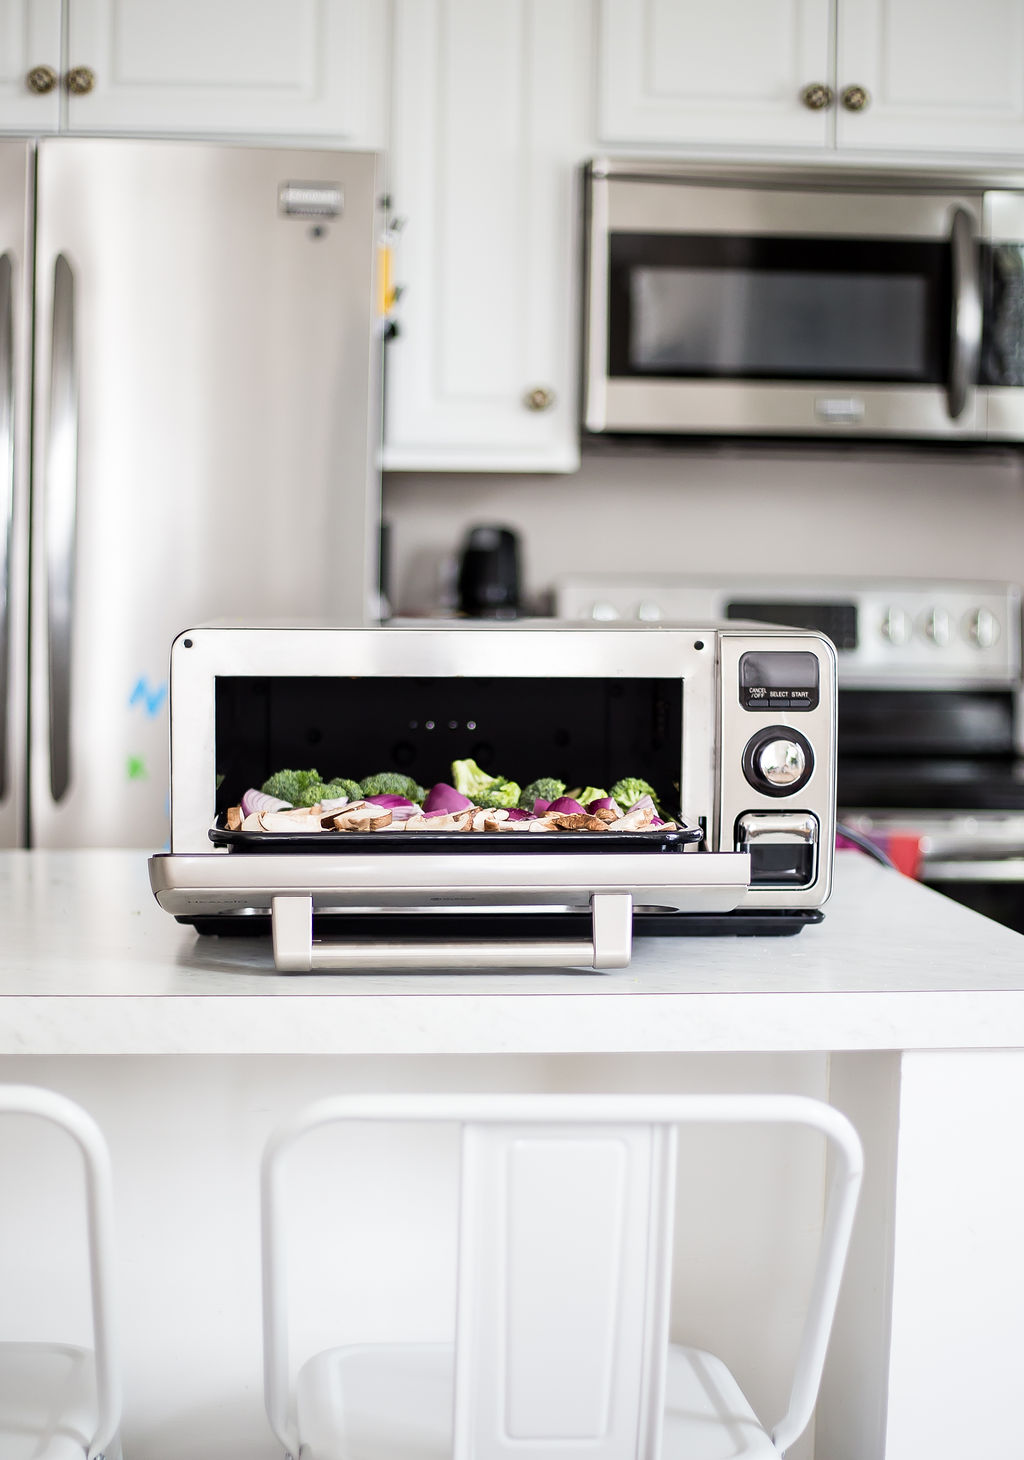 Sharp Supersteam Countertop Oven on a white kitchen island.